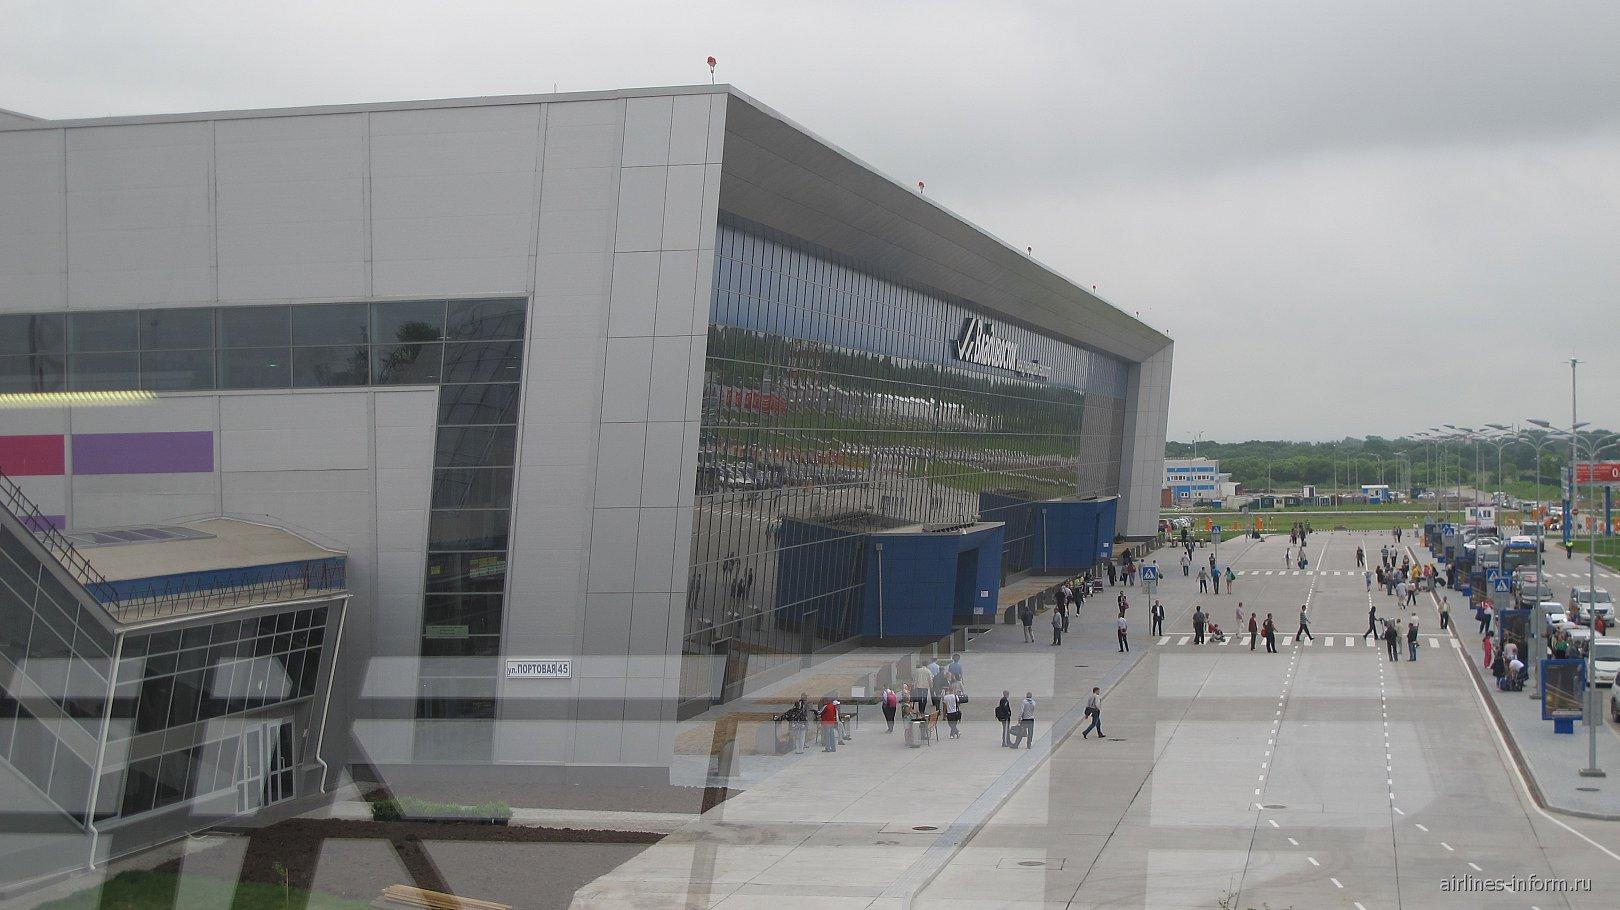 Пассажирский терминал в аэропорту Владивосток Кневичи